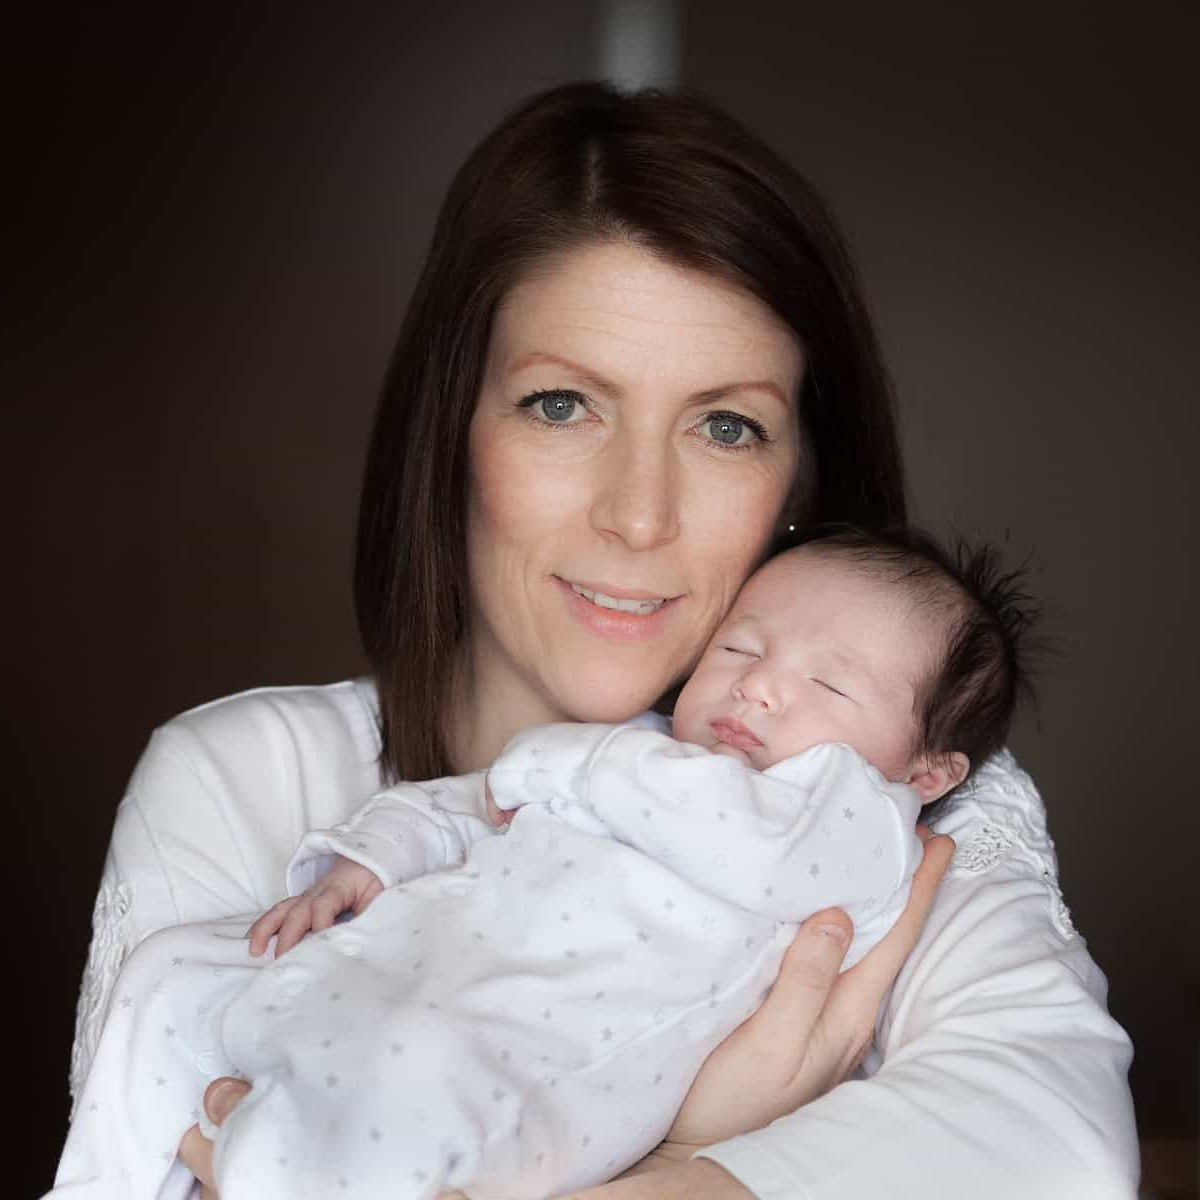 Newborn Photoshoots at home. Edinburgh and surrounding areas. 14